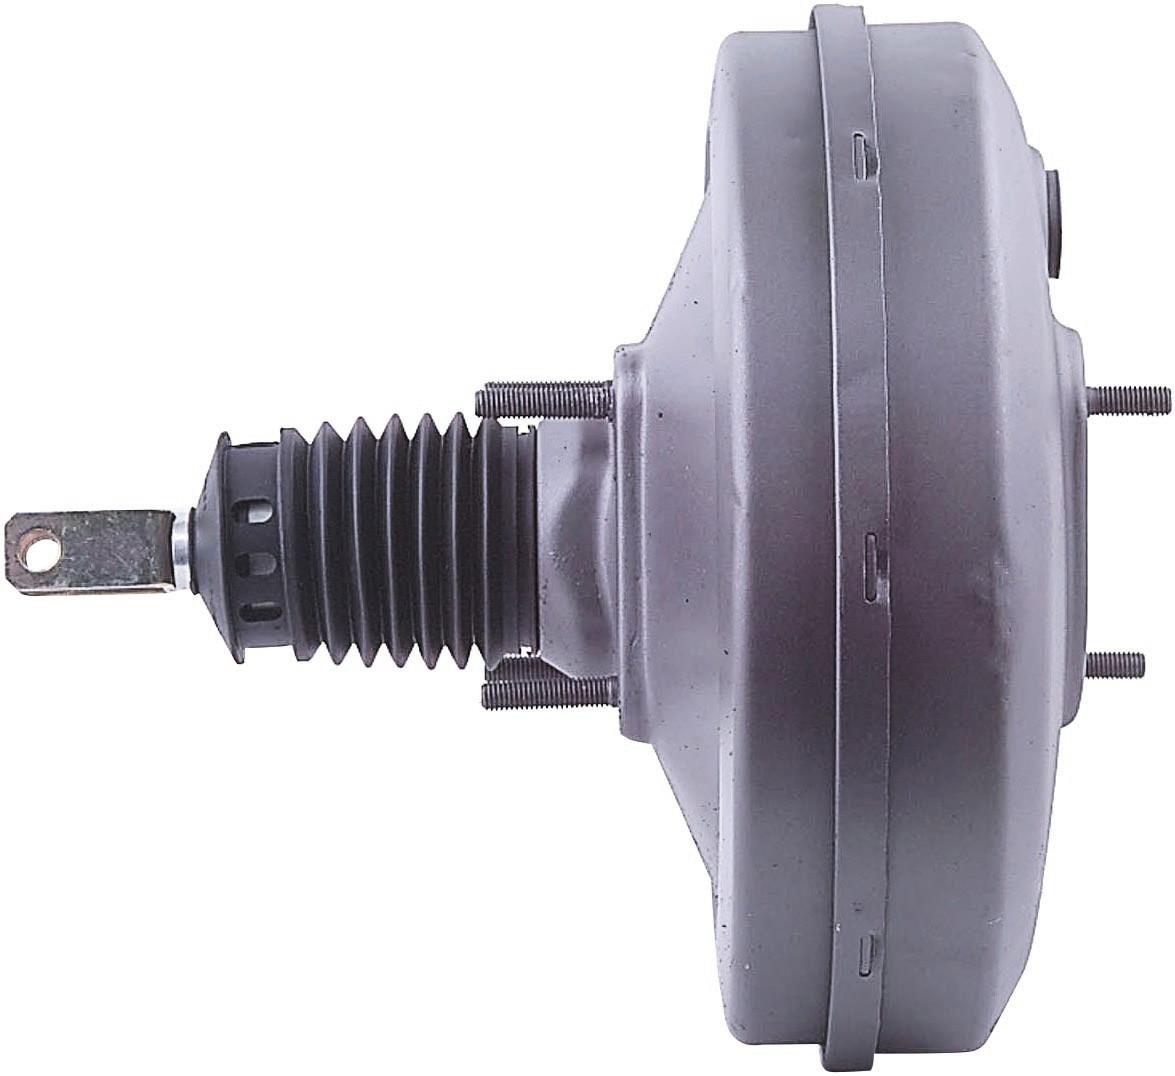 Imagen de Reforzador de Frenos Vacío sin Cilindro Maestro Remanufacturado para BMW 540i 1997 Marca CARDONE Remanufacturado Número de Parte 53-2673